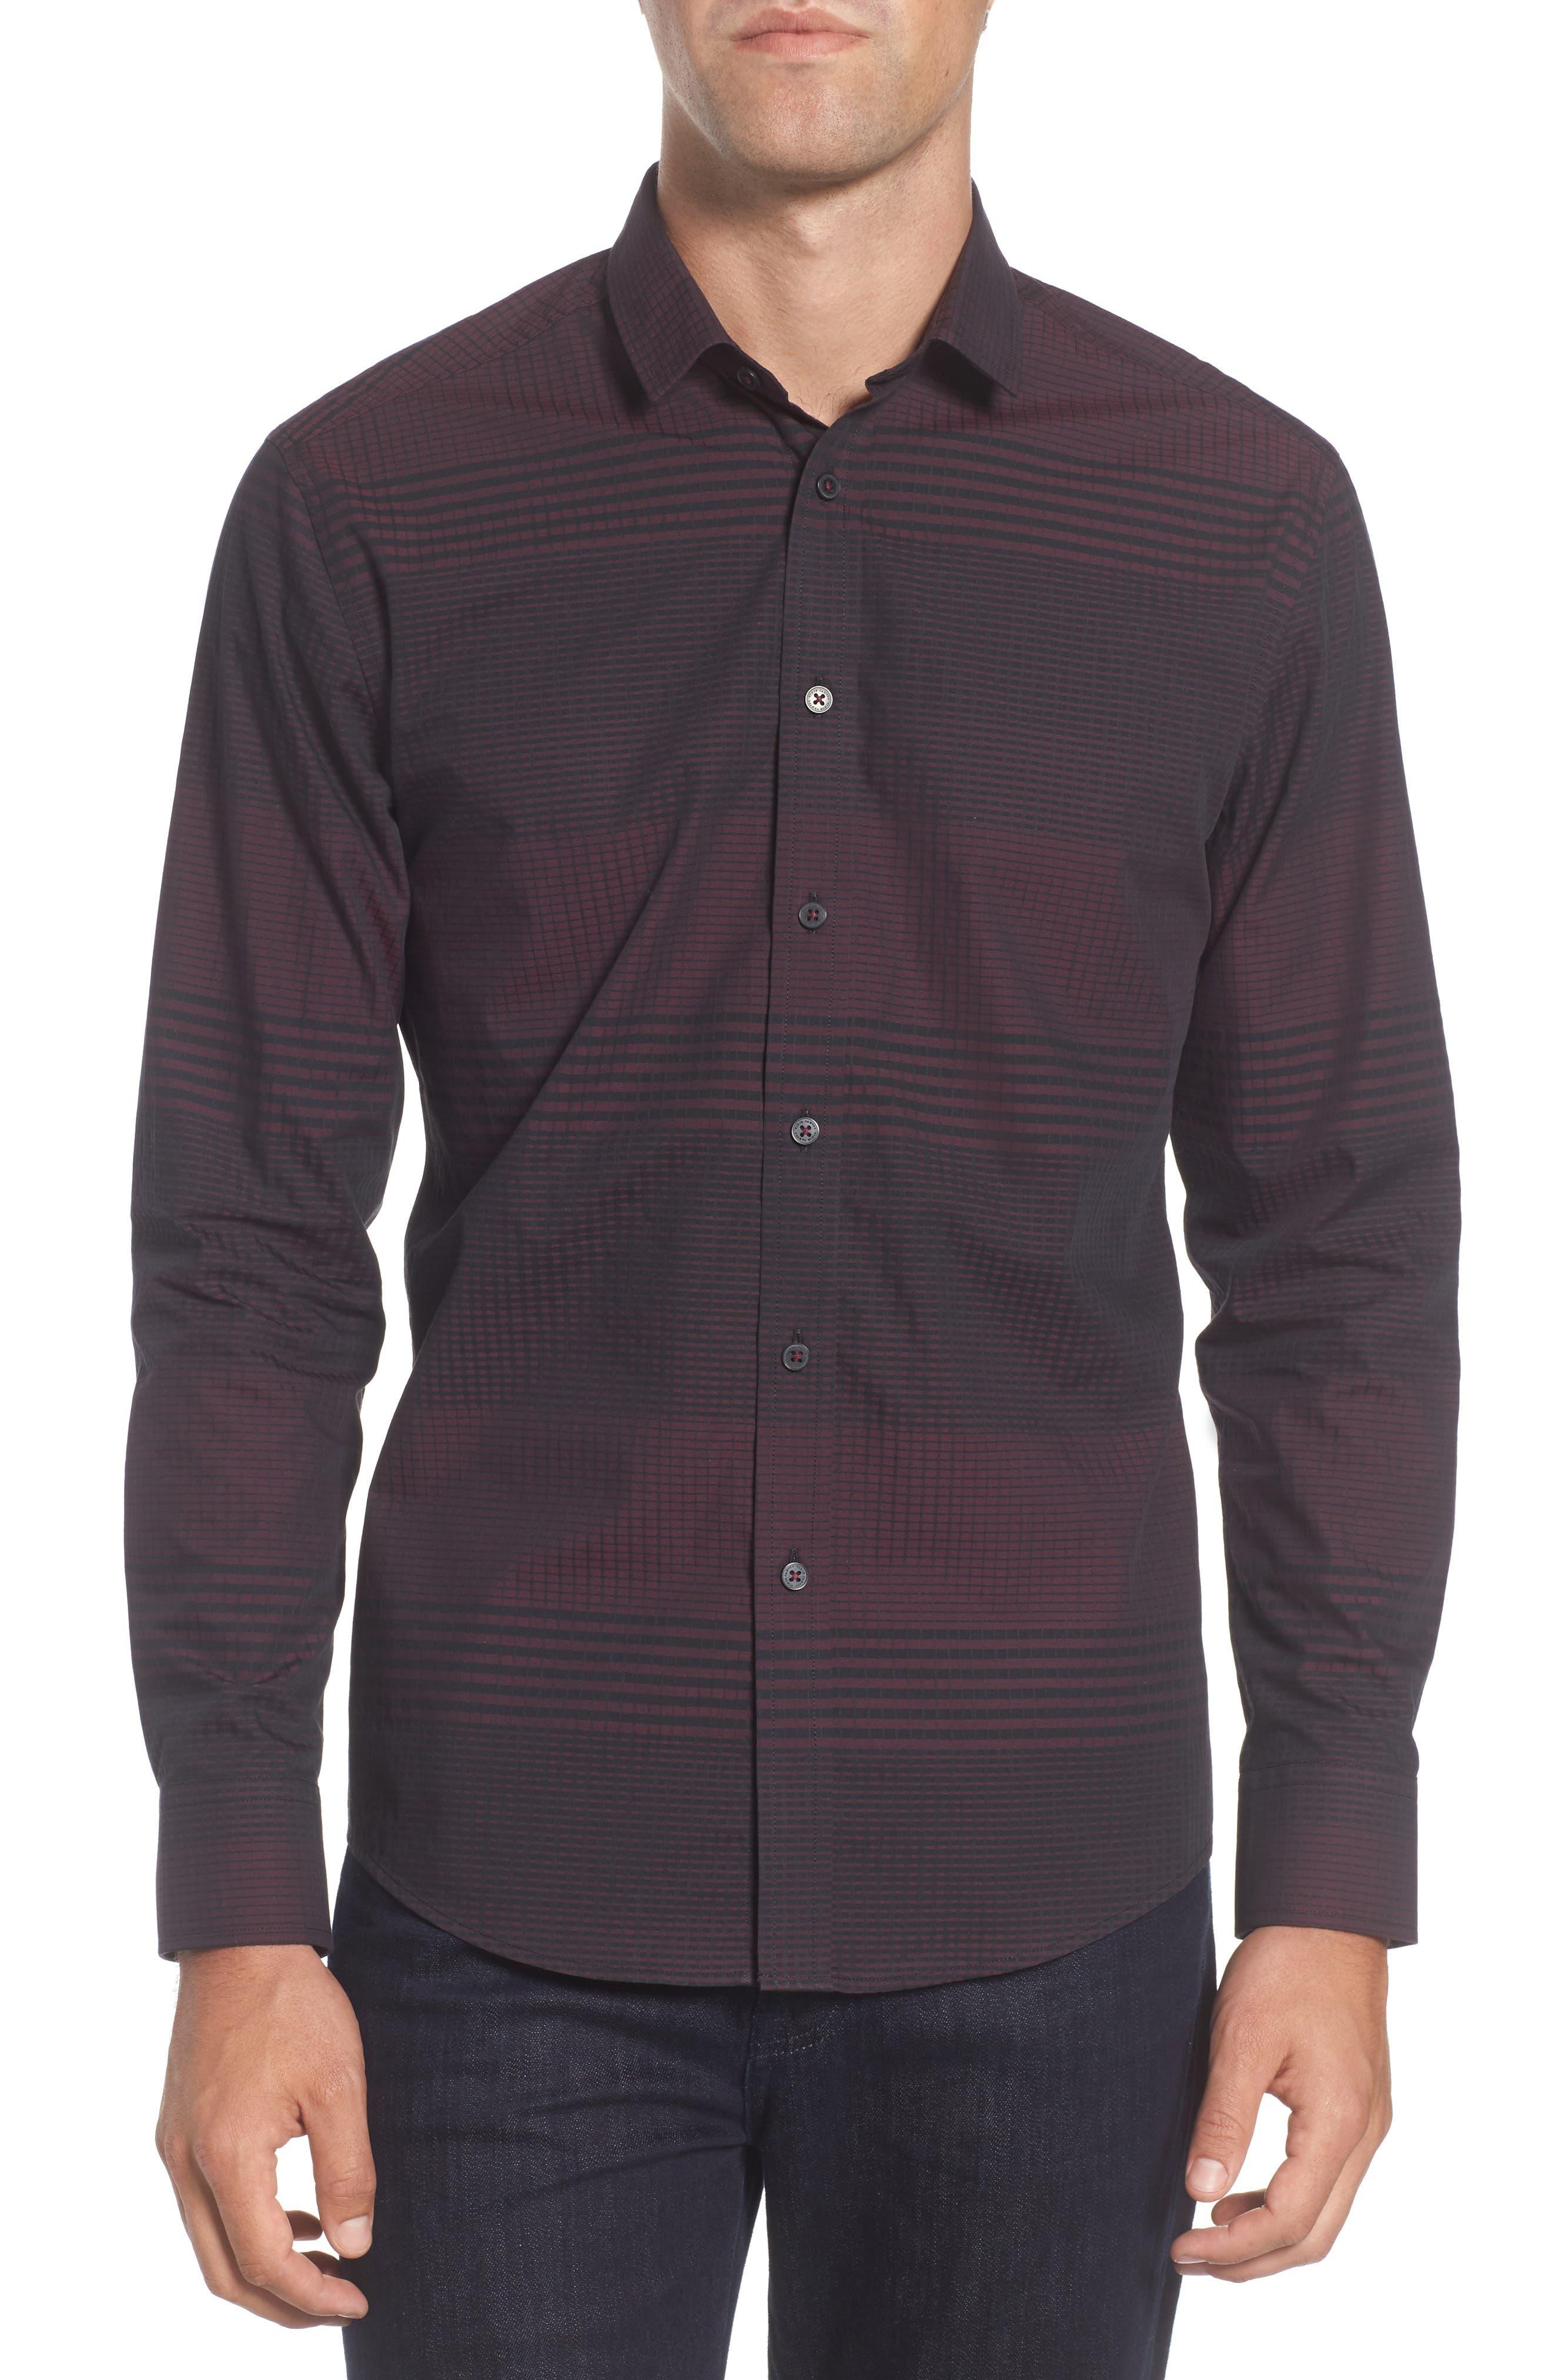 Alternate Image 1 Selected - Vince Camuto Slim Fit Check Plaid Sport Shirt